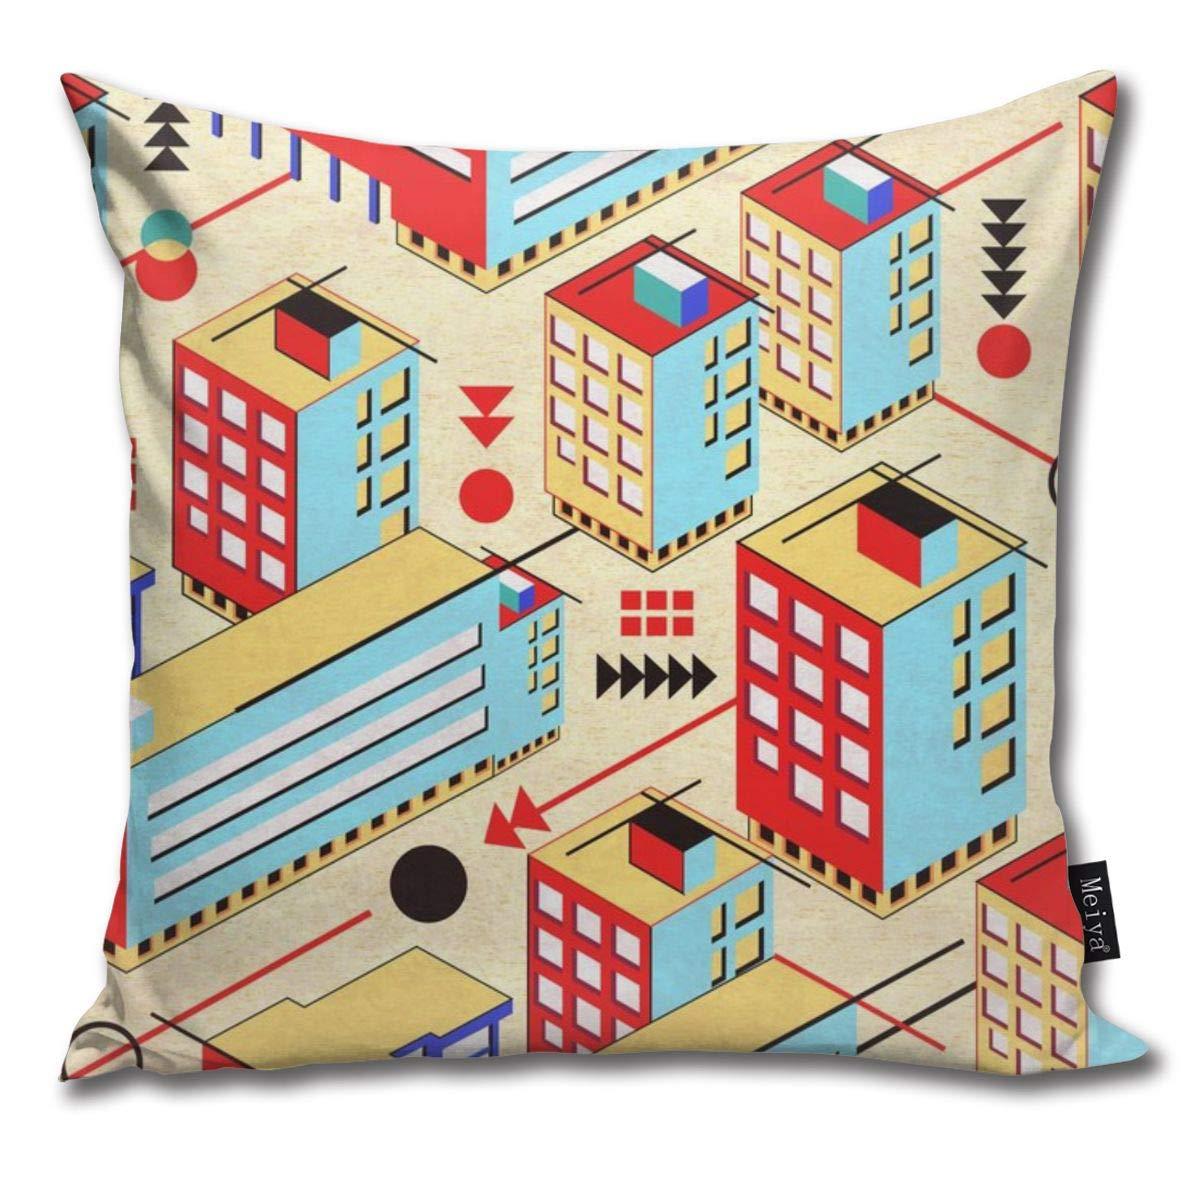 Amazon.com: Brecoy Bauhaus City Throw Pillow Cushion Cover ...